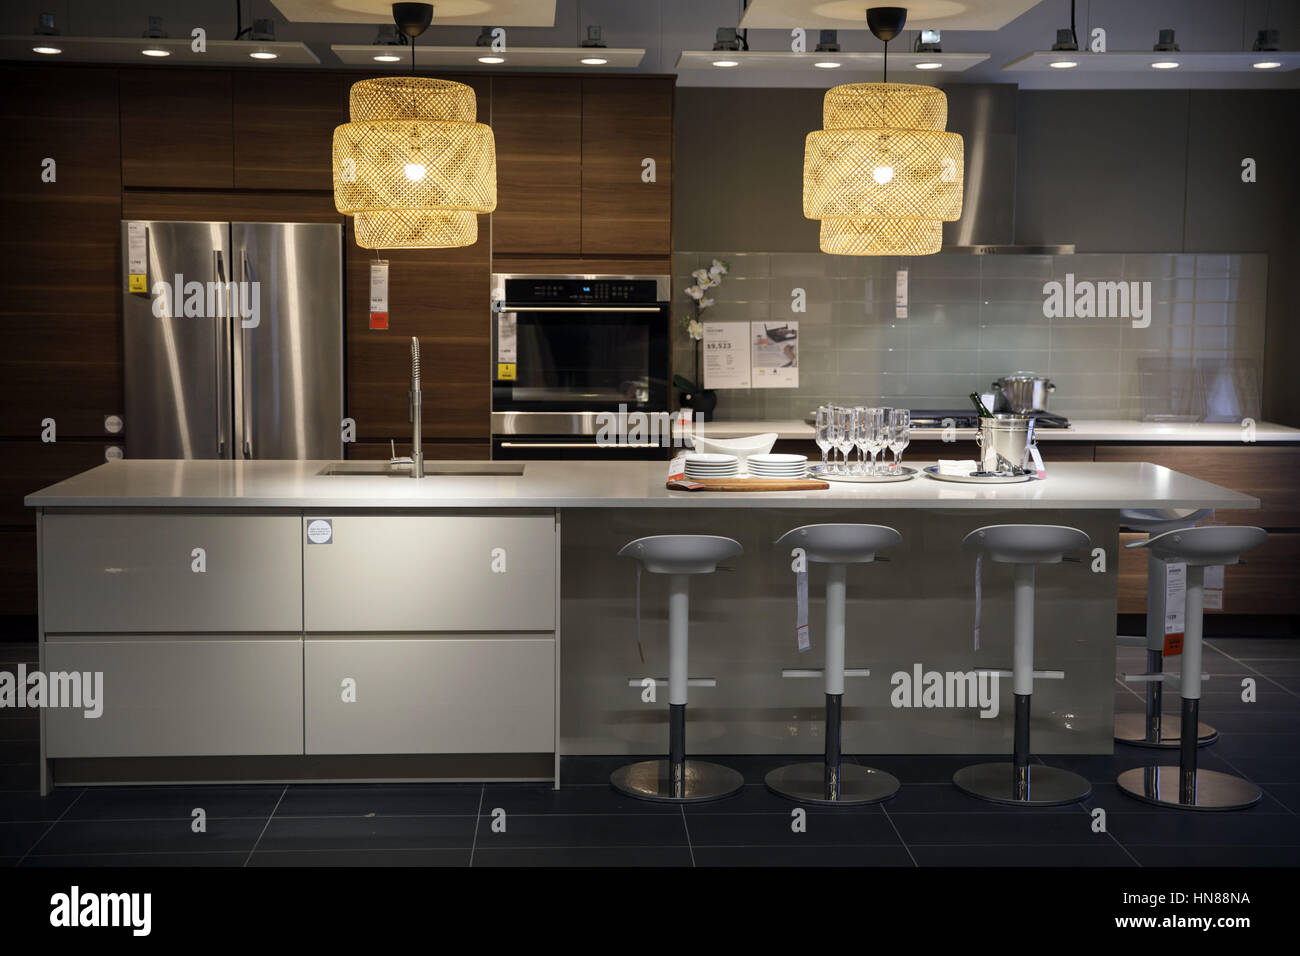 Lampen Ikea Hang : Burbank ca usa februar lampen hängen in einer küche